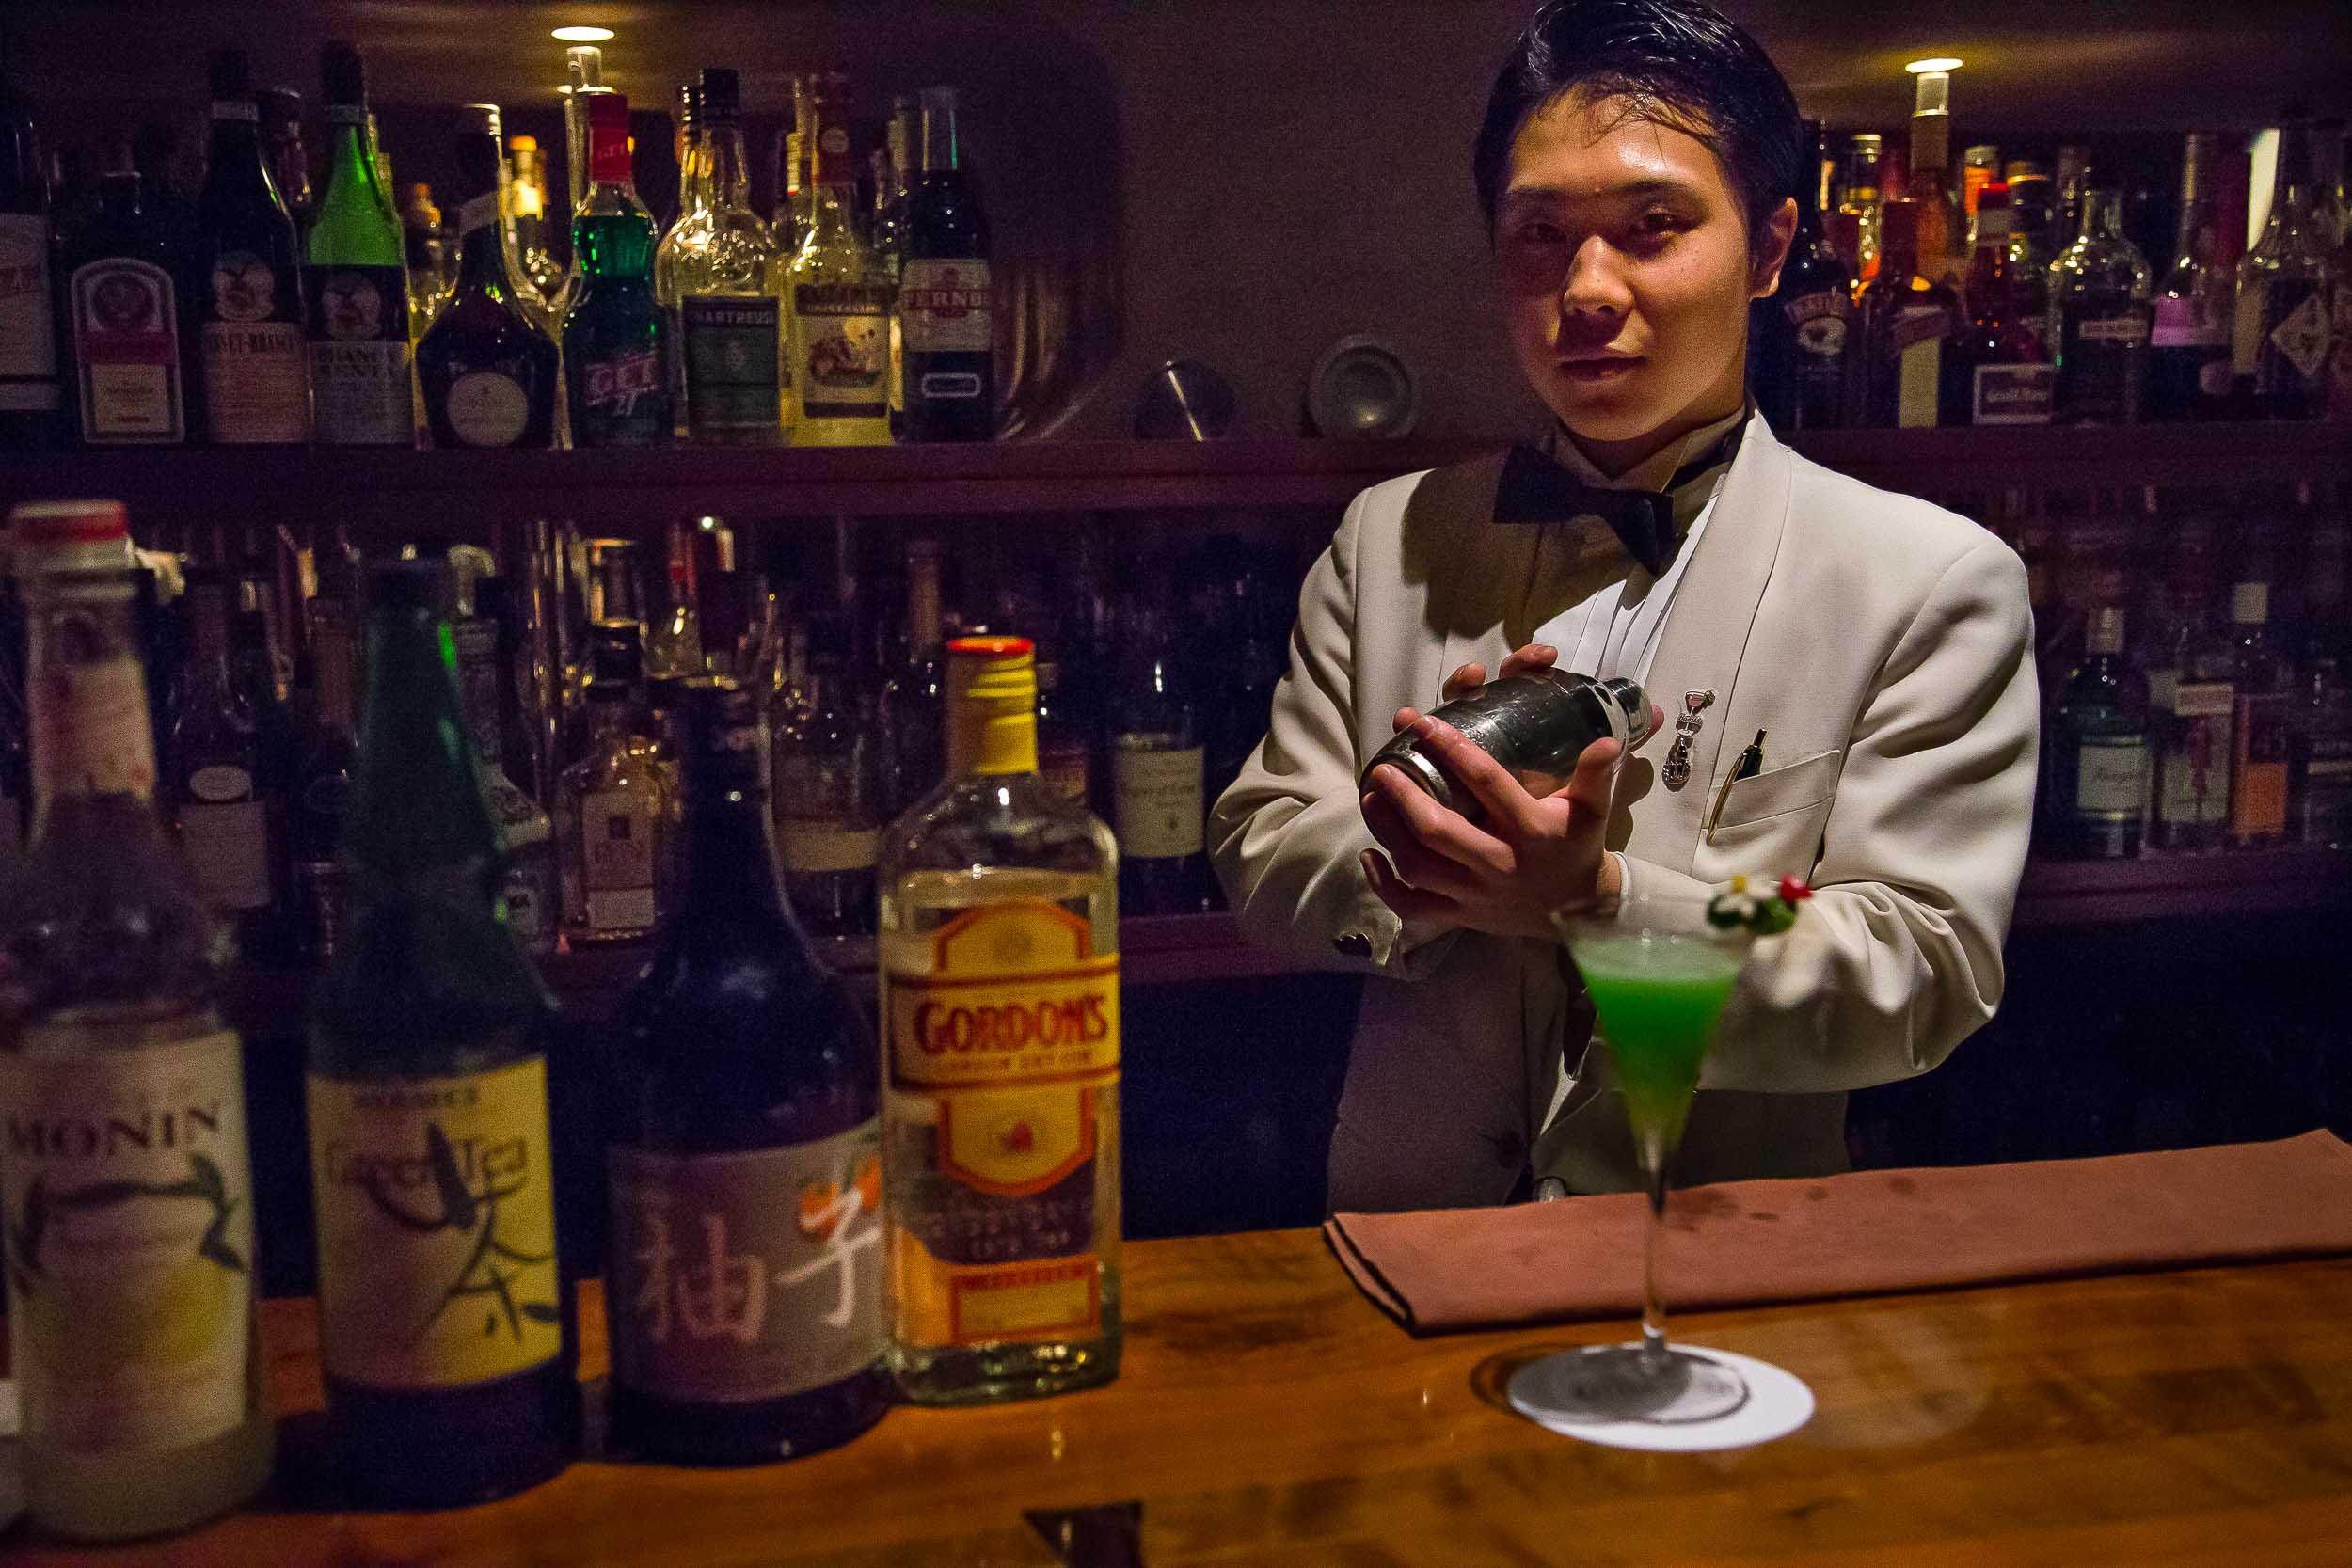 My bartender, Yuta, winner of best bartender in Japan under the age of 28.